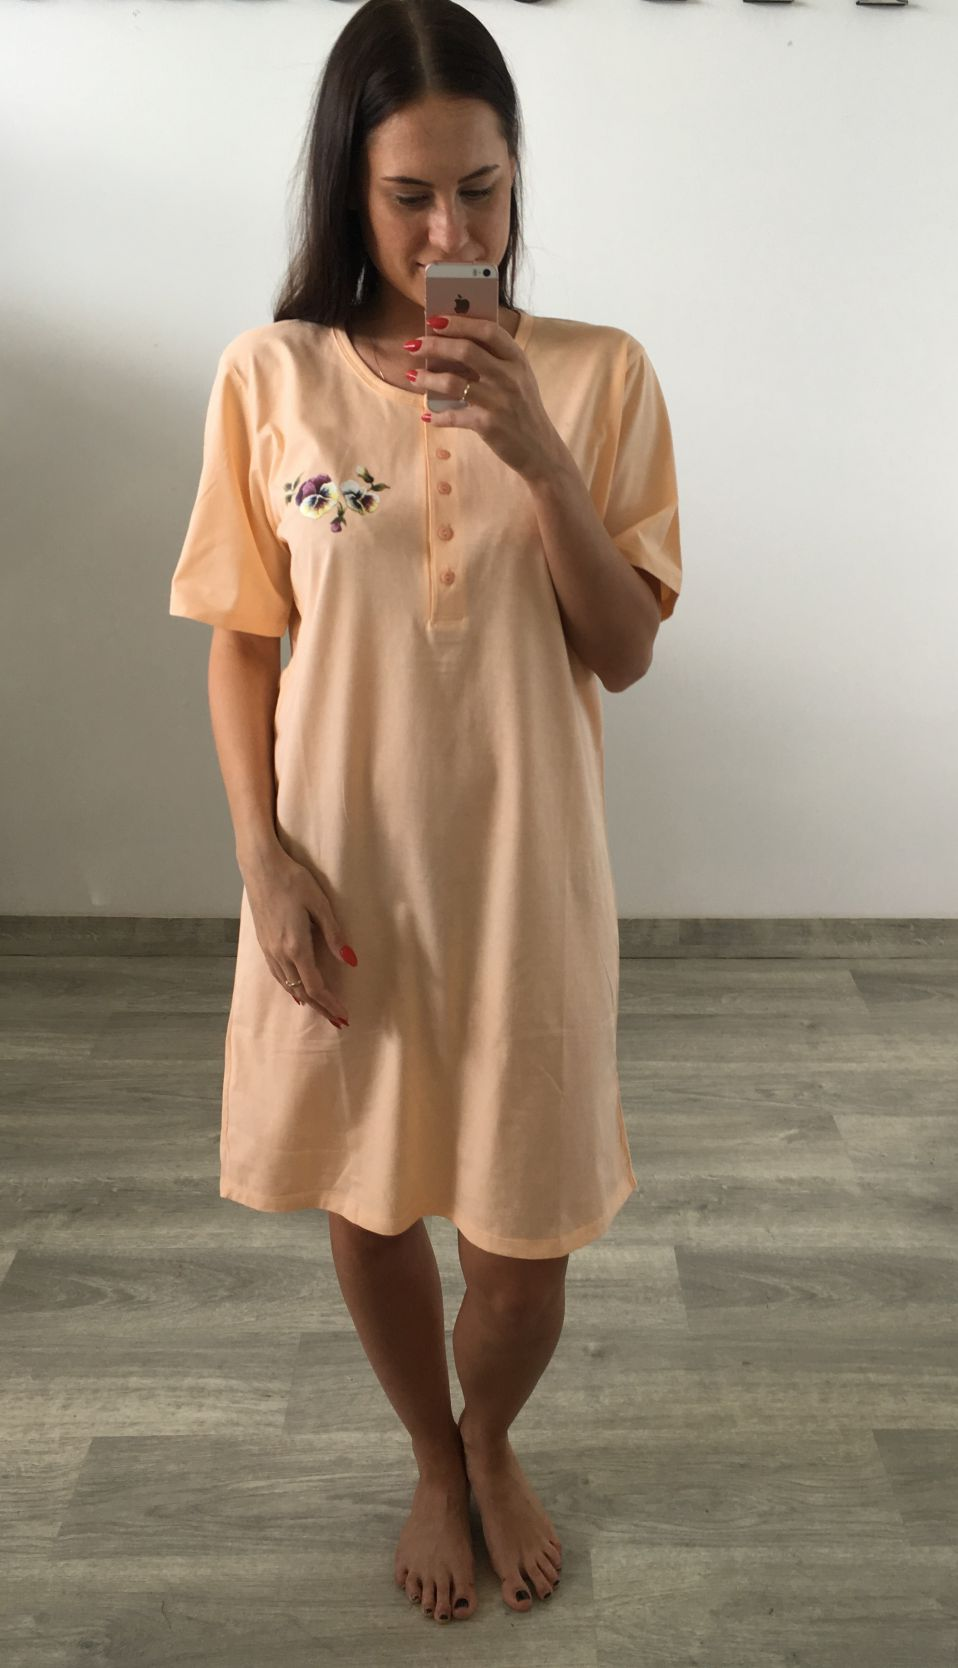 Nightgown BENTER 61610